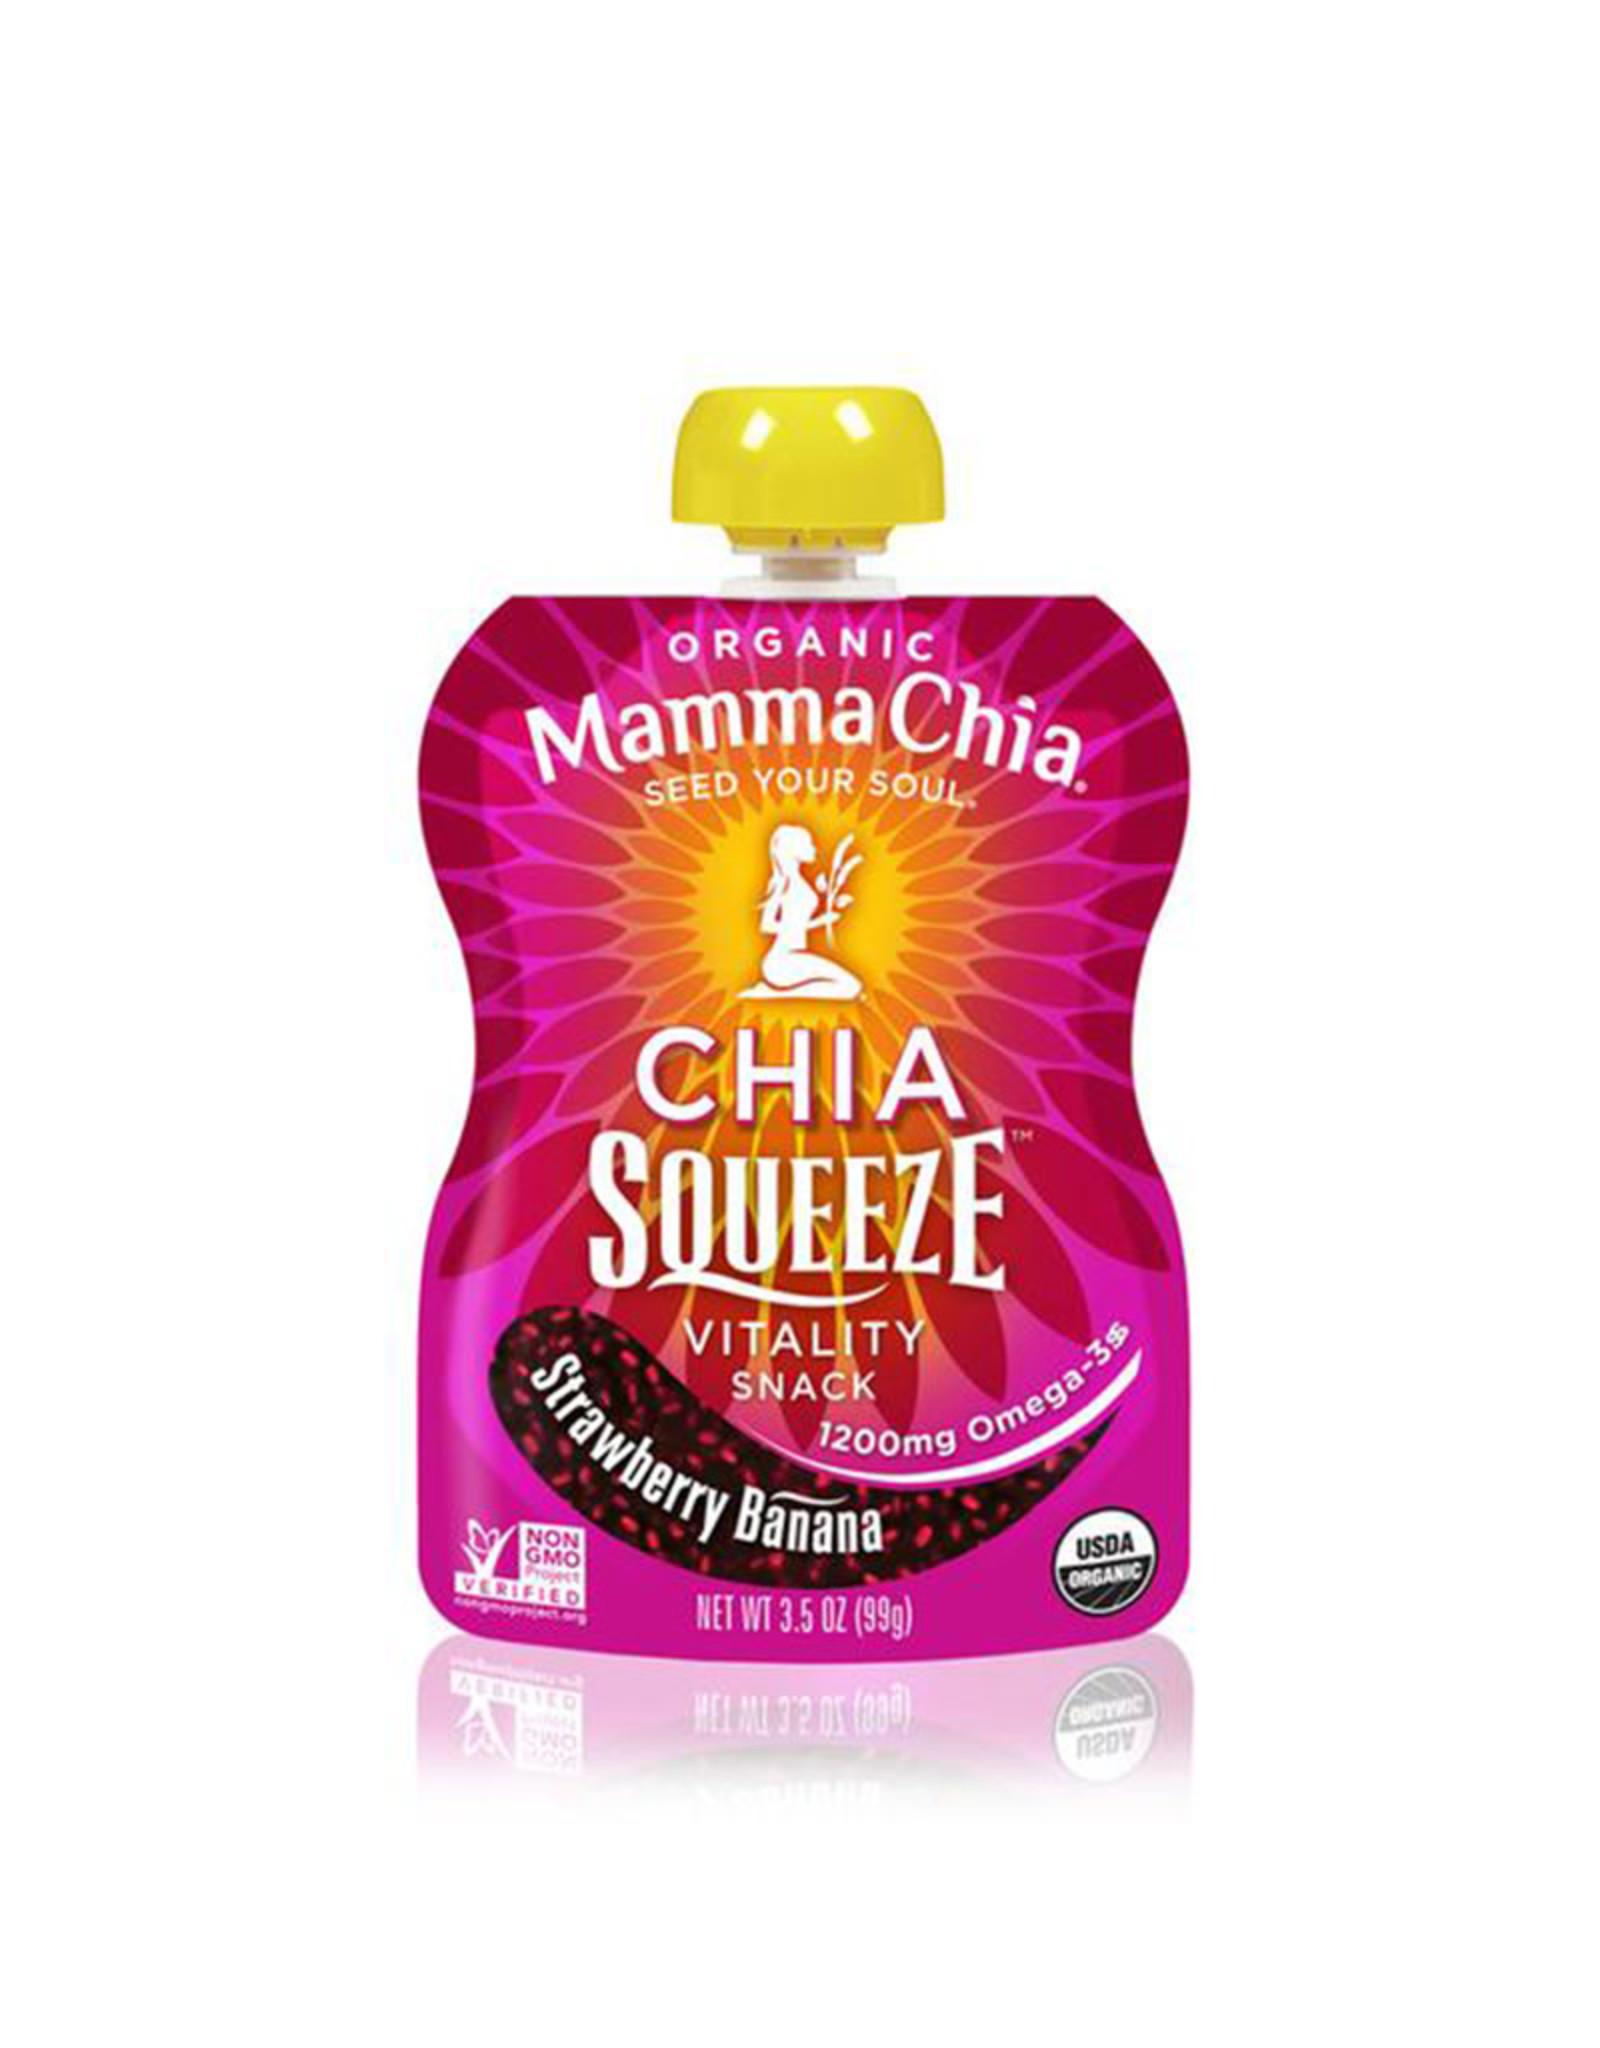 Mamma Chia Mamma Chia - Chia Squeeze, Banane aux Fraises (99g)